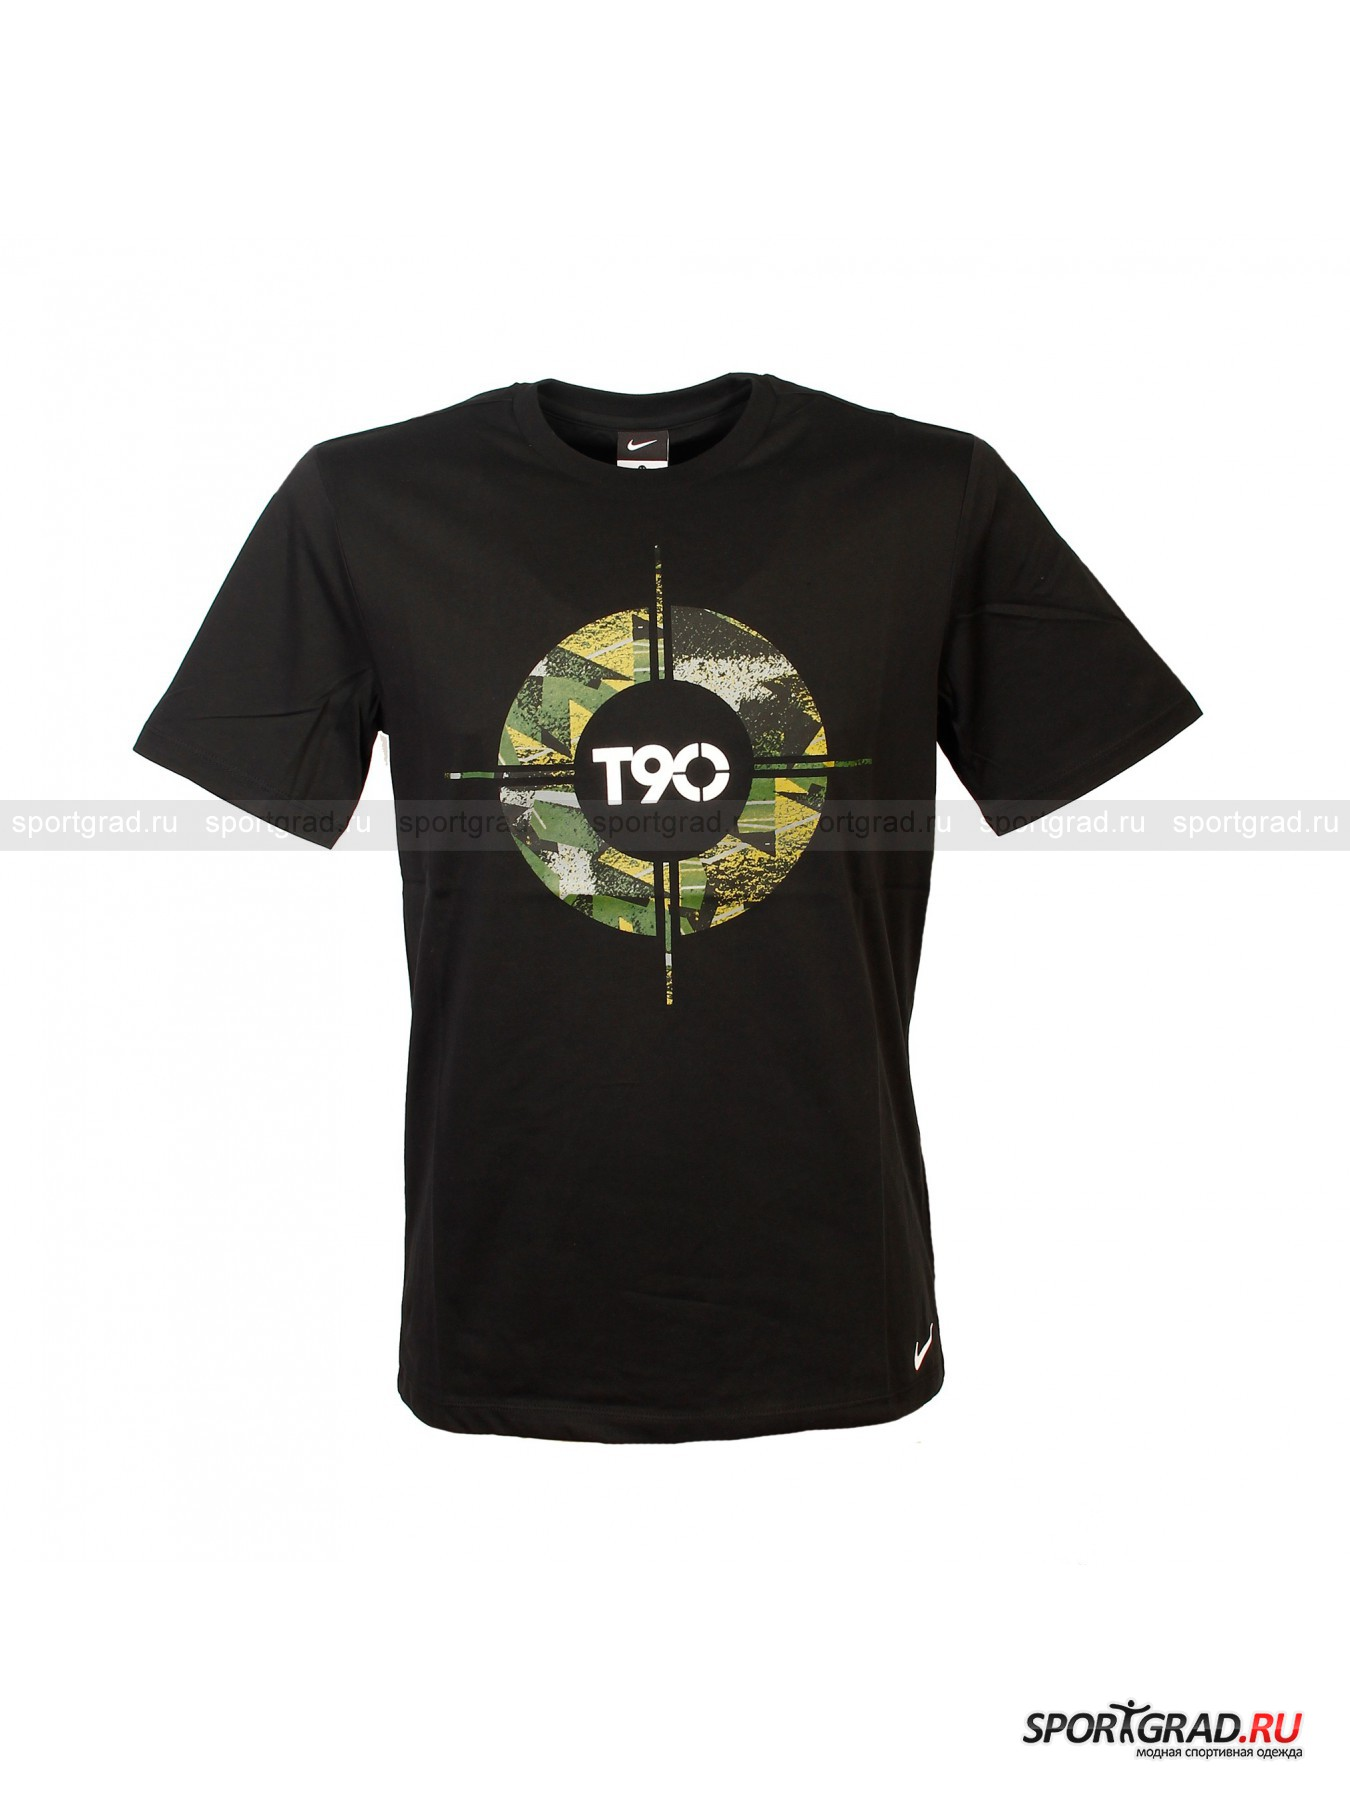 Футболка мужская T90 SS TOP 2 NIKE